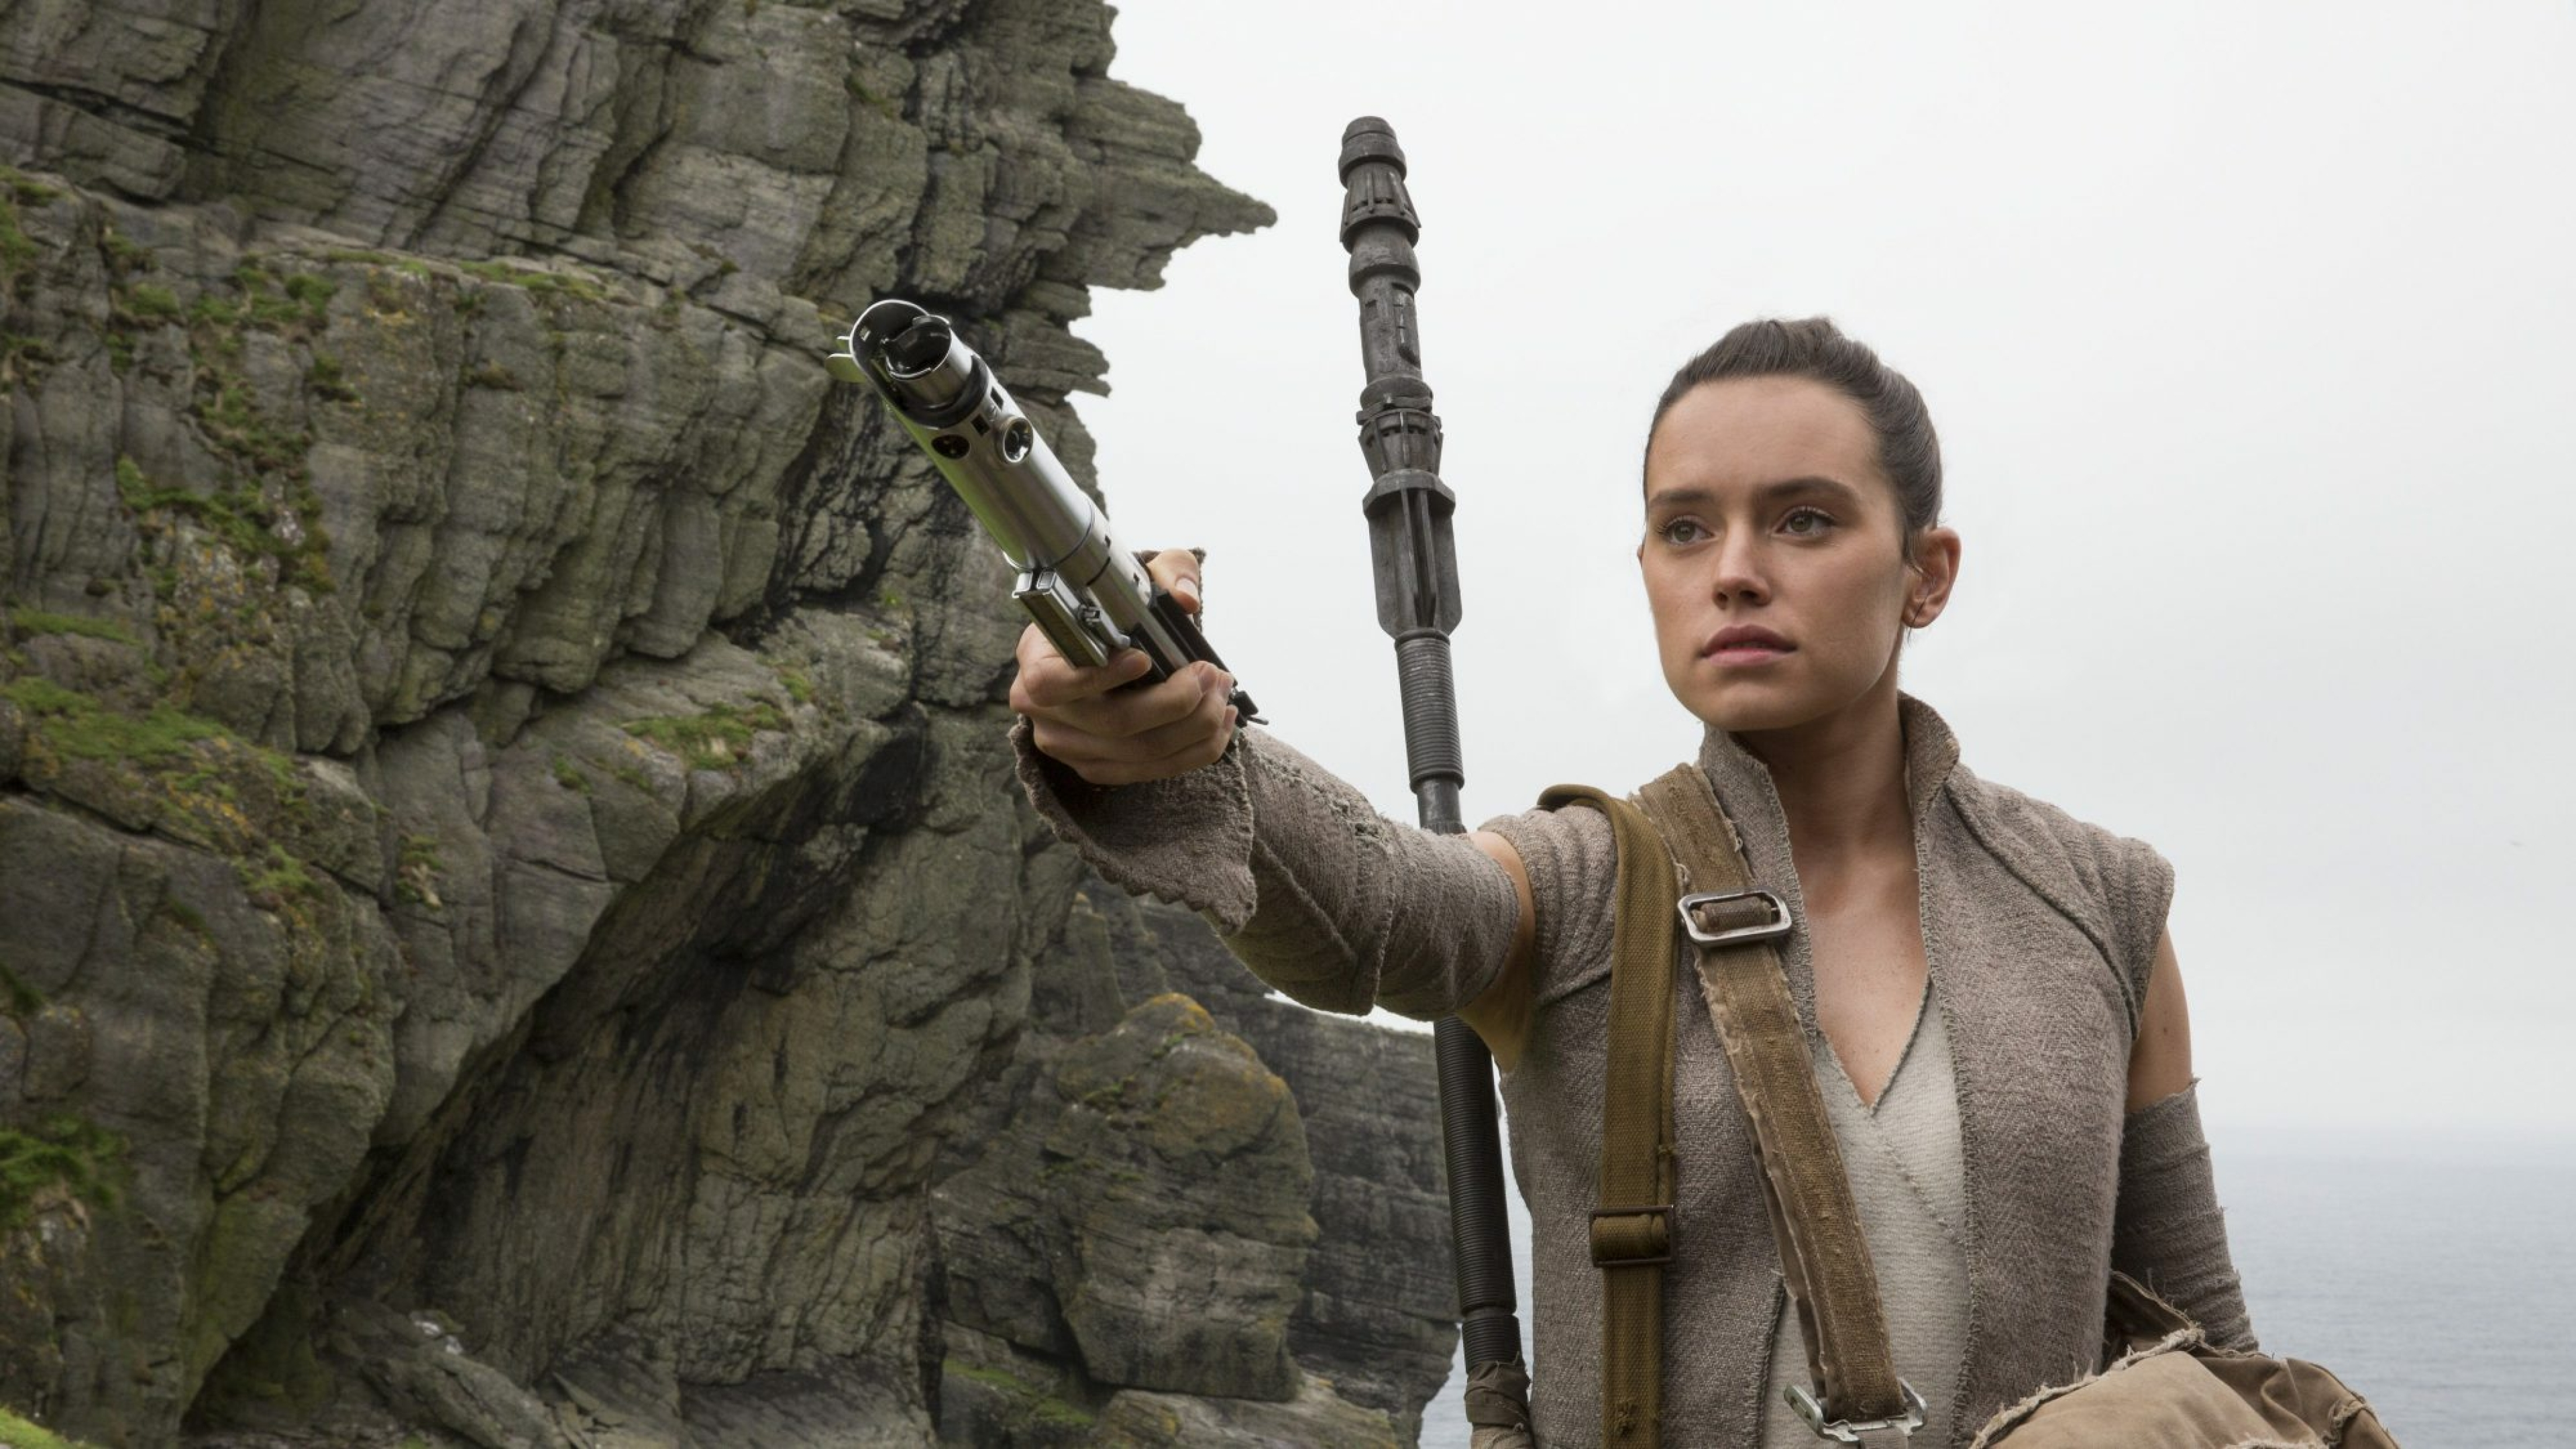 Rey In Star Wars 8 The Last Jedi, Full HD 2K Wallpaper